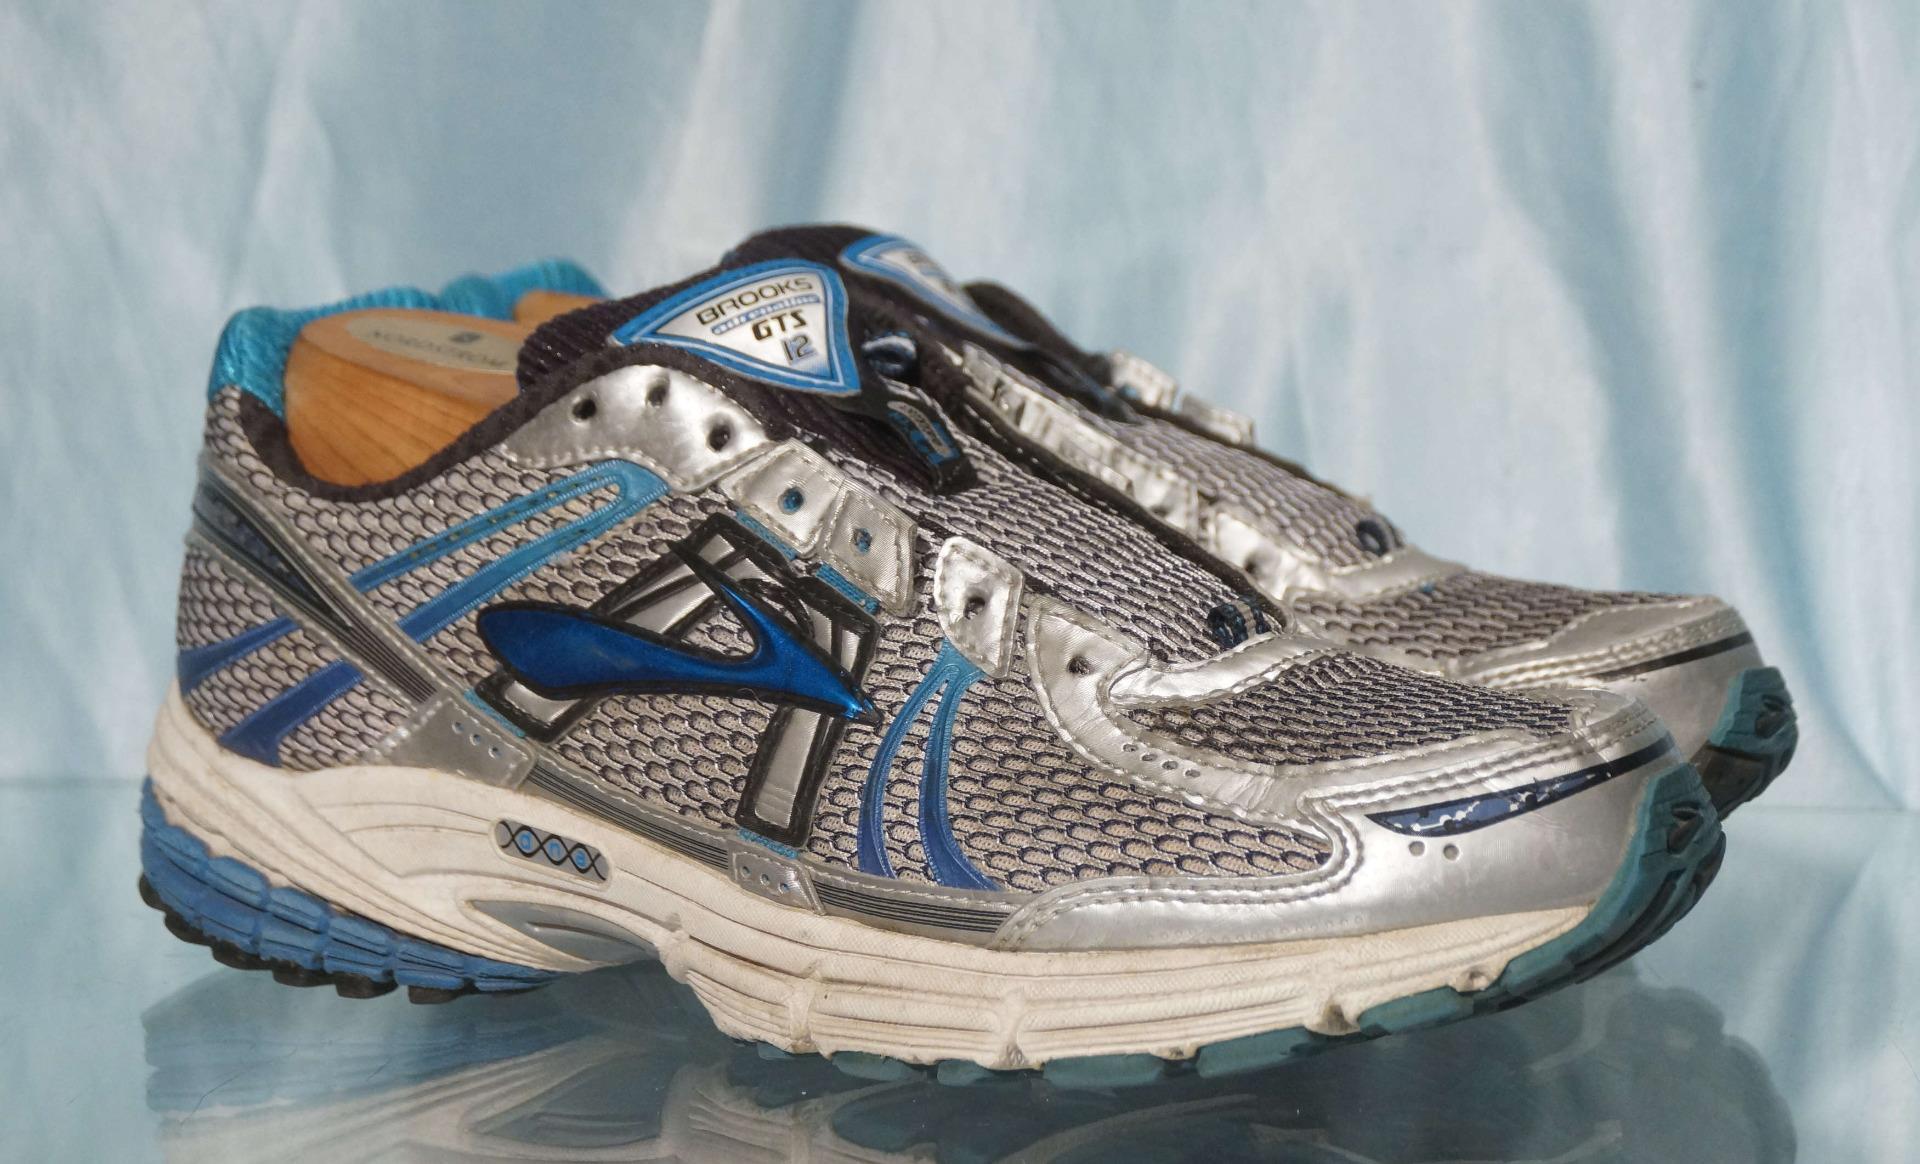 e275522421b Blue Silver Black BROOKS GTS Adrenaline 12 Running Shoes US Sz 9 UK ...